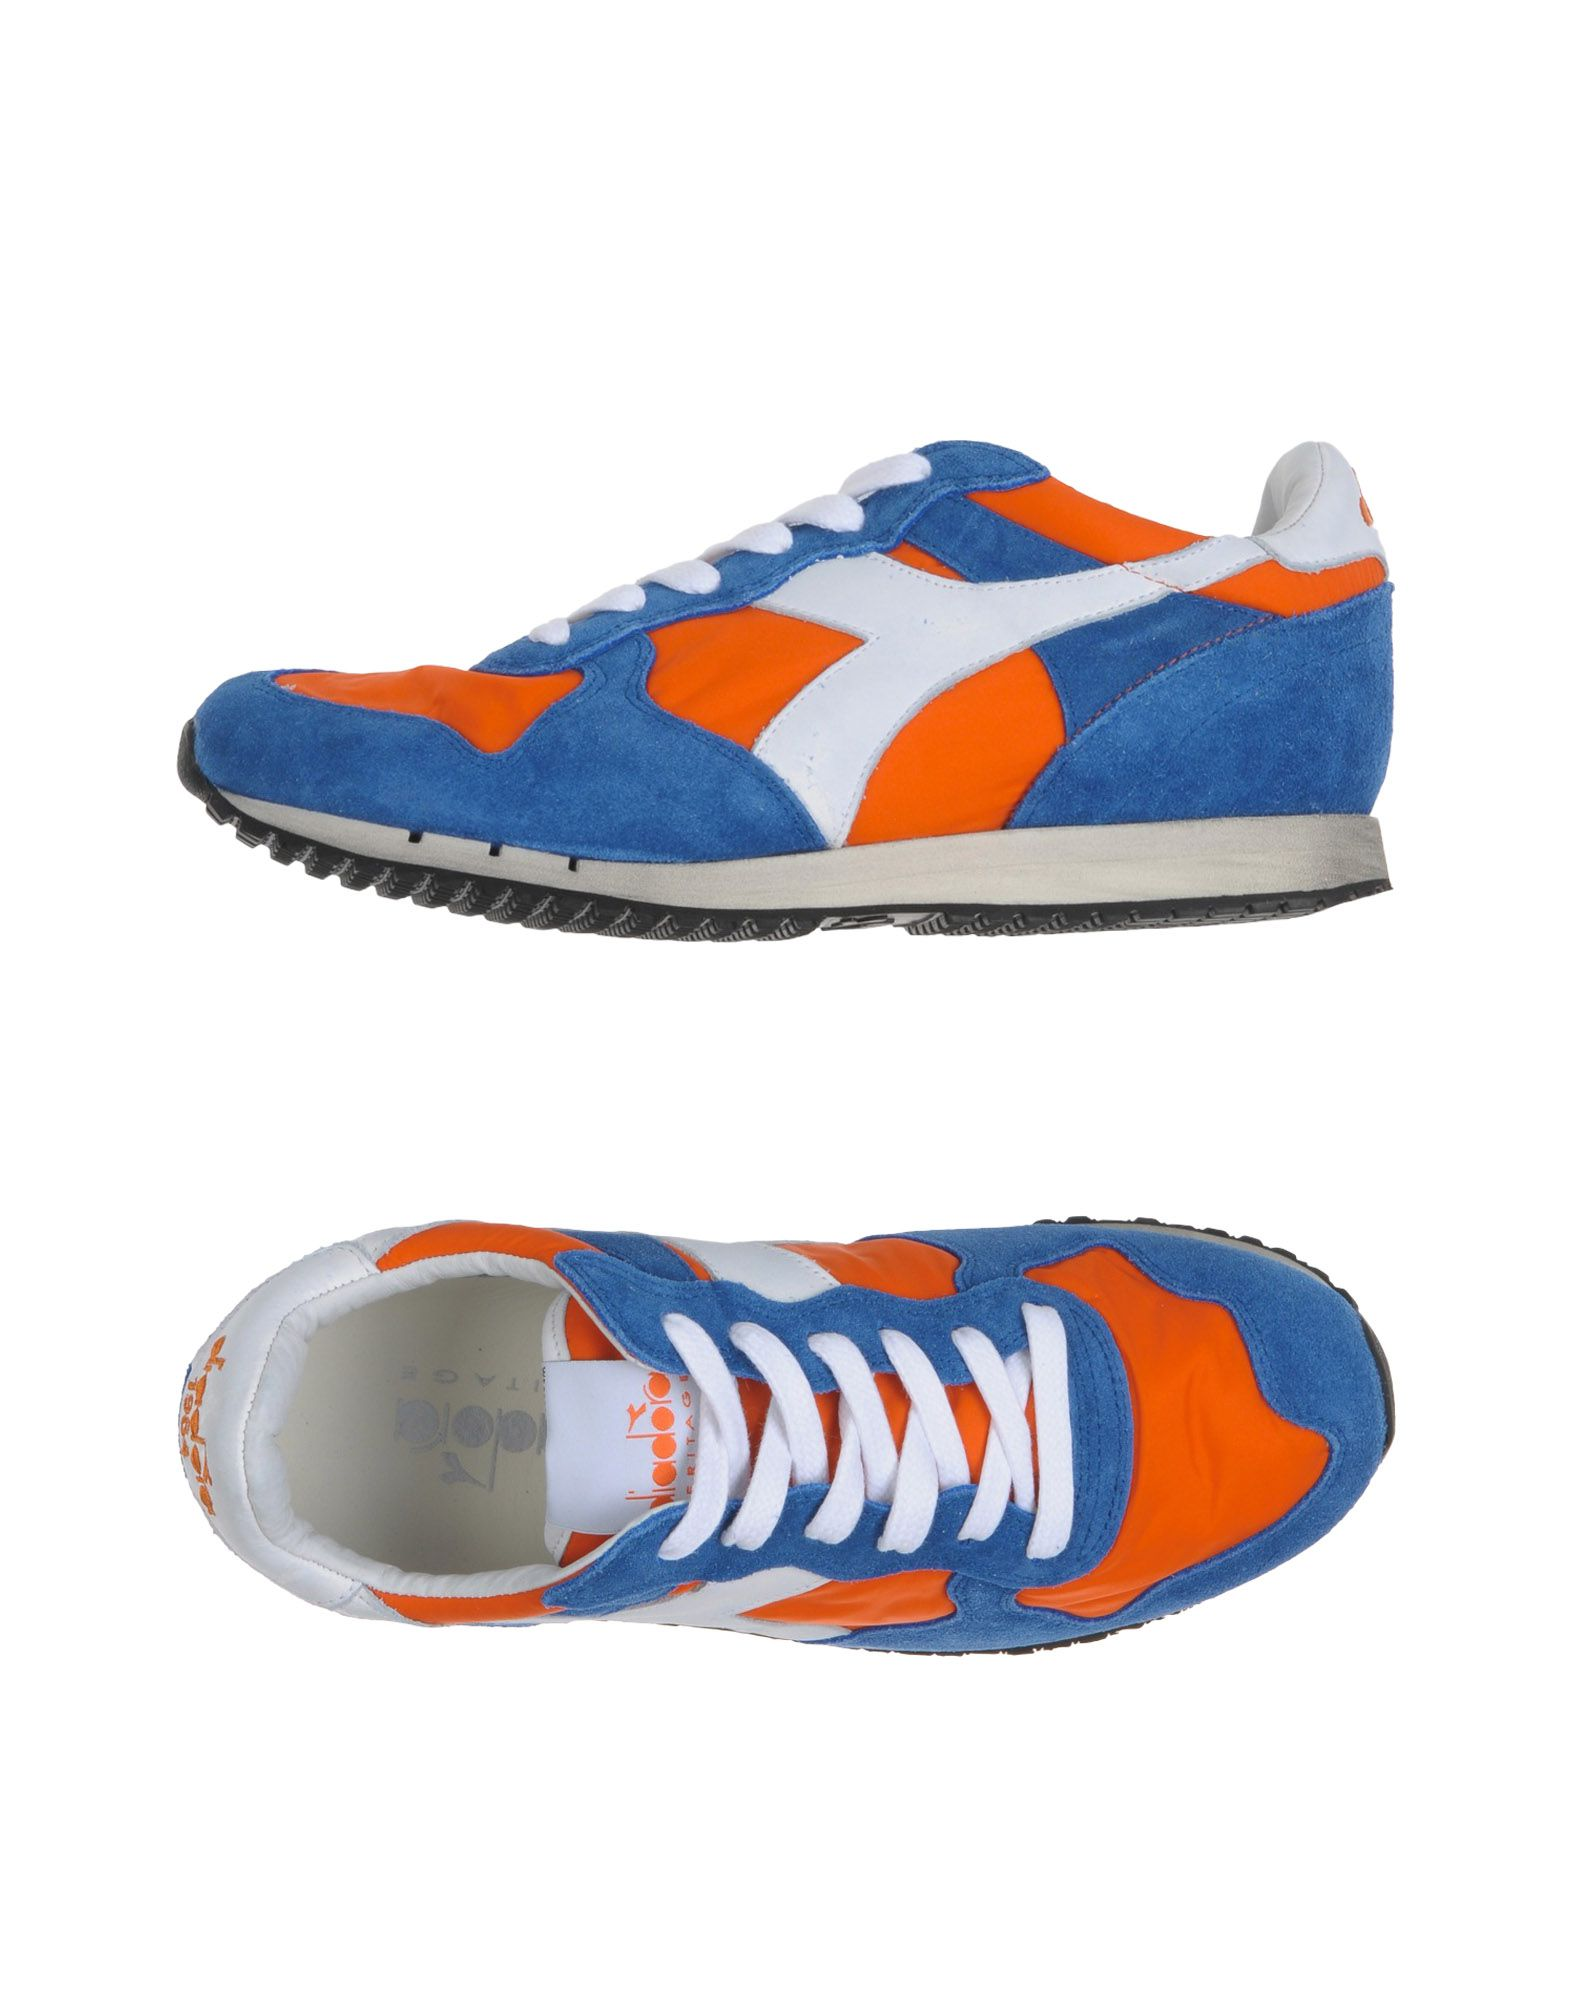 a history of diadora footwear company